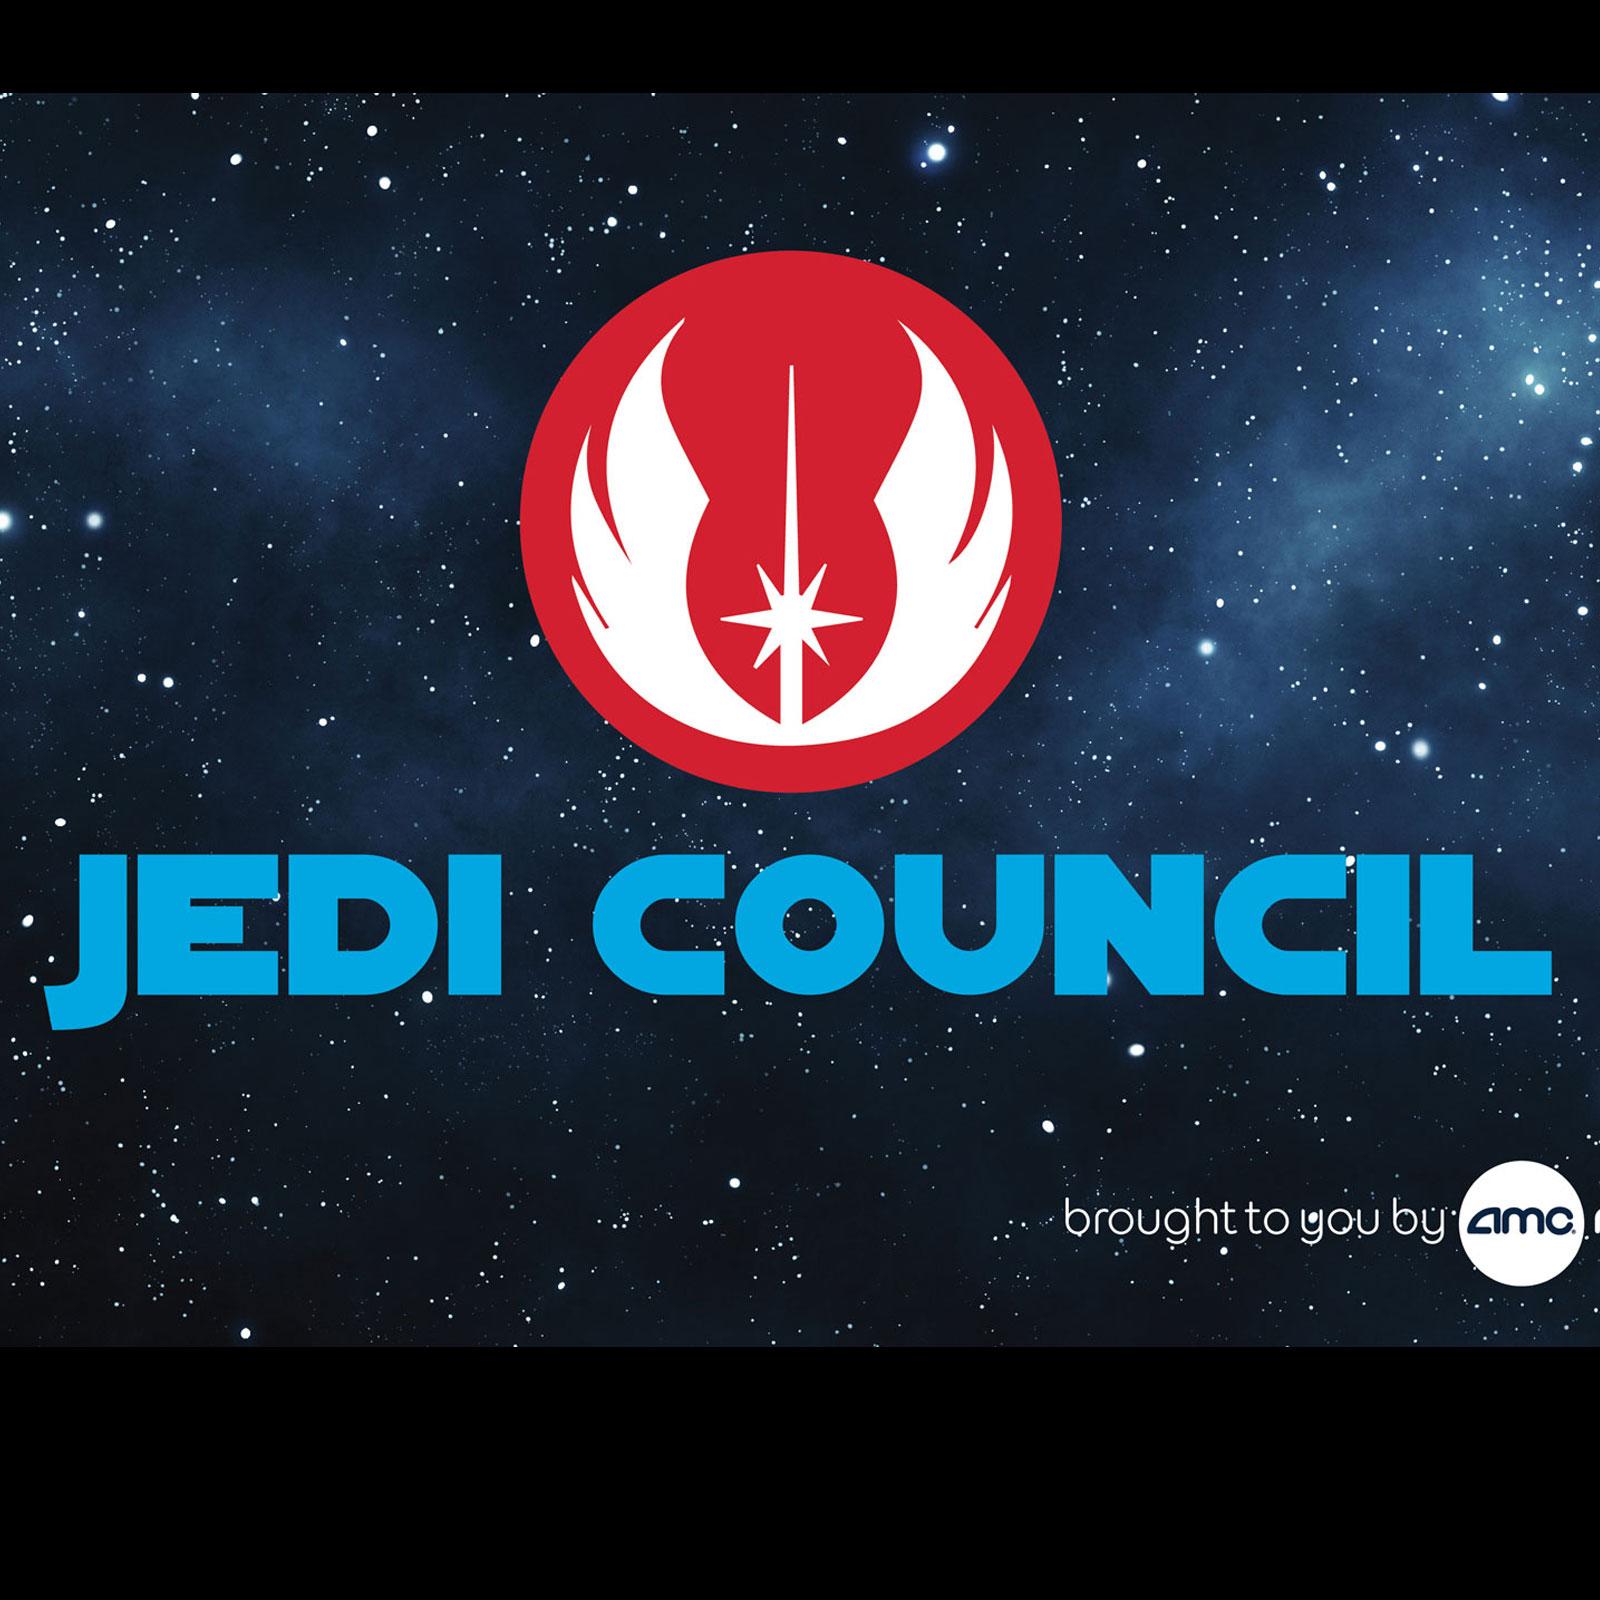 AMC Jedi Council - THE FORCE AWAKENS TRAILER AT COMIC-CON!